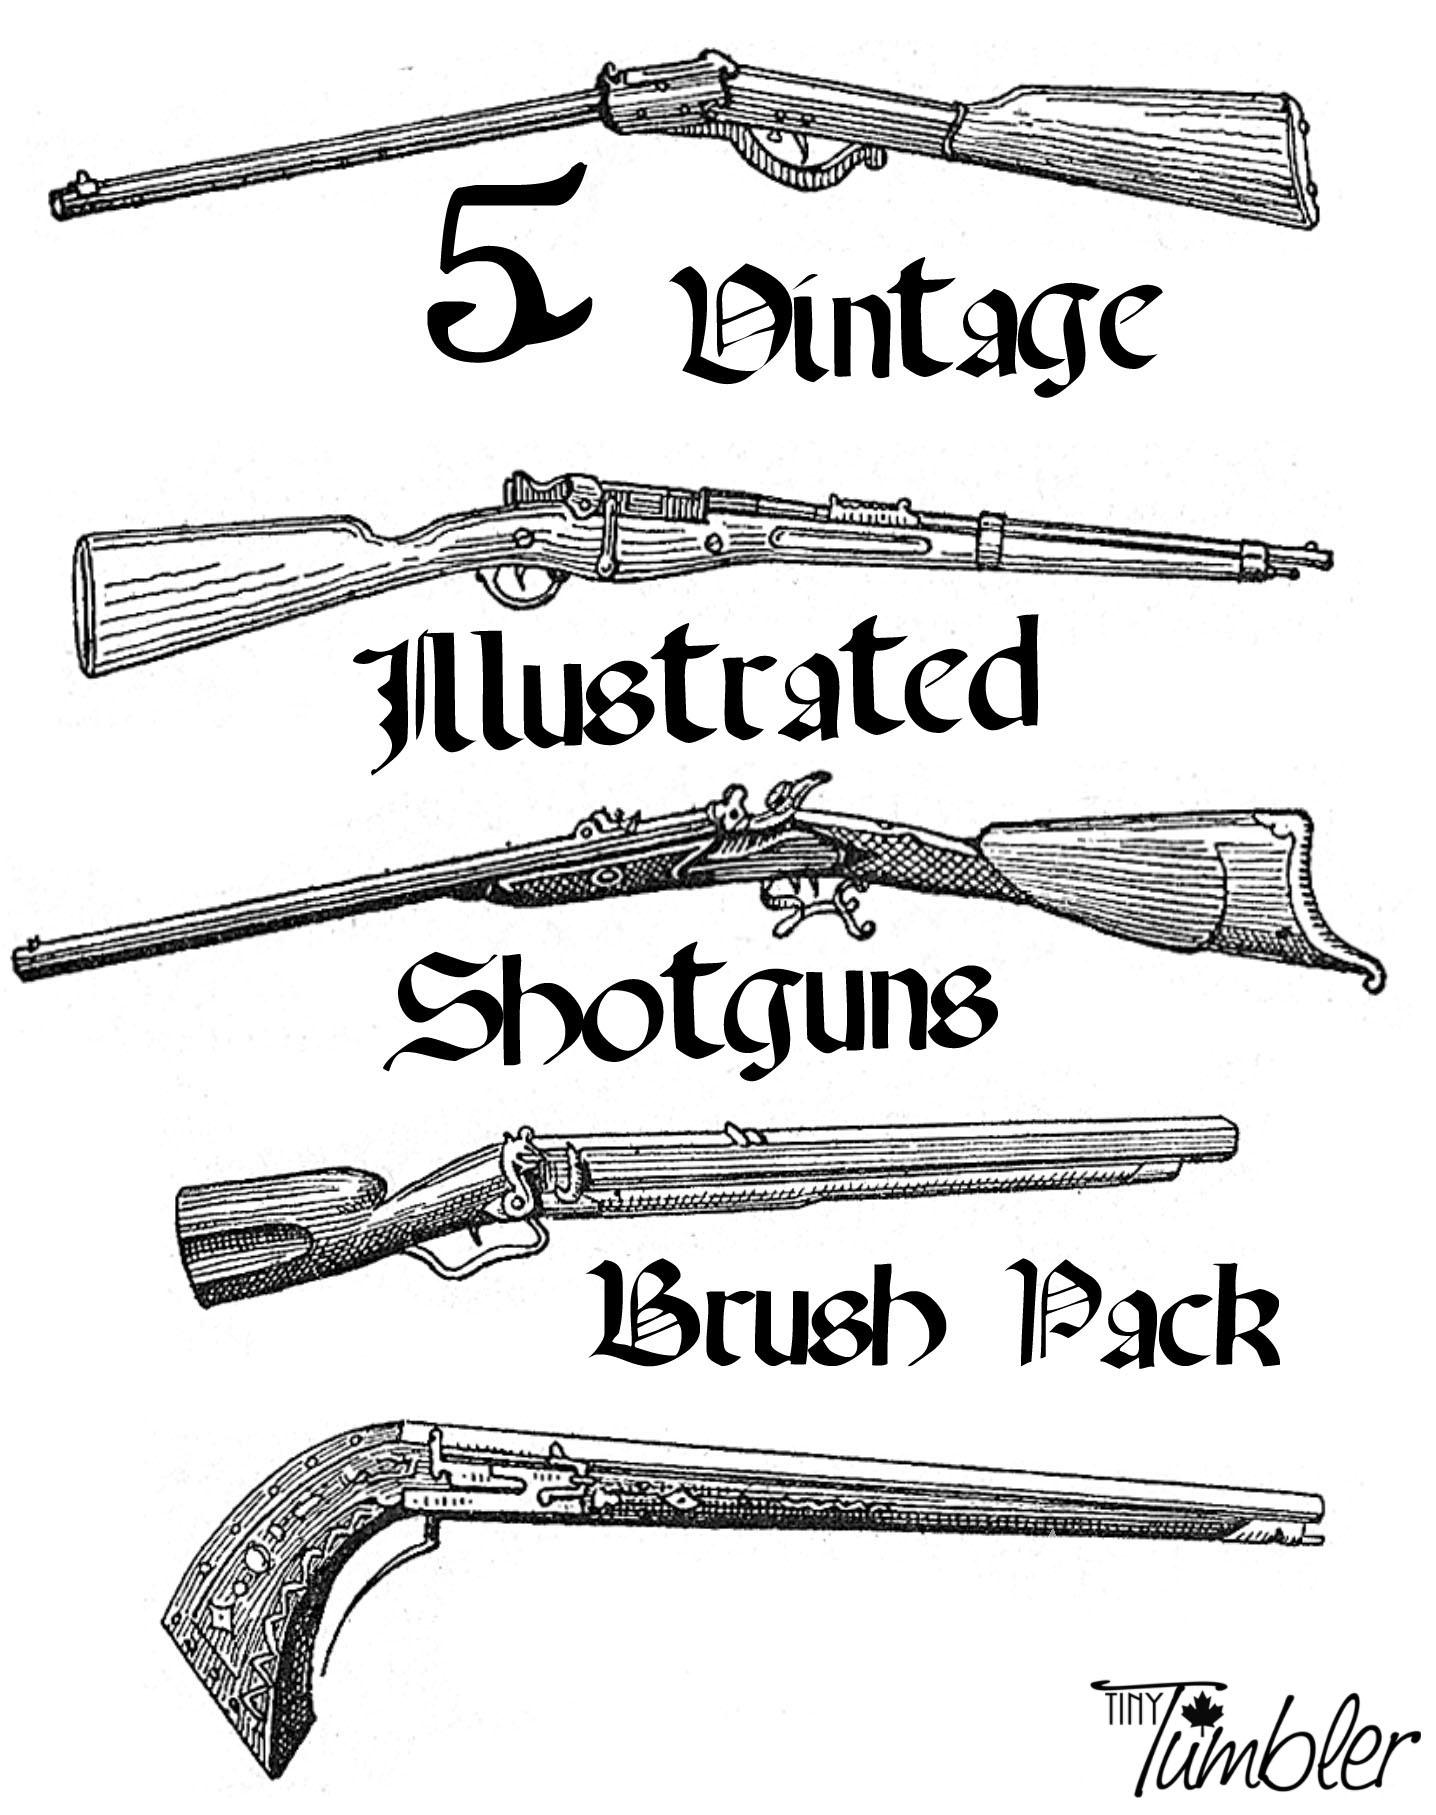 Vintage Shotguns Brushpack by TinyTumbler